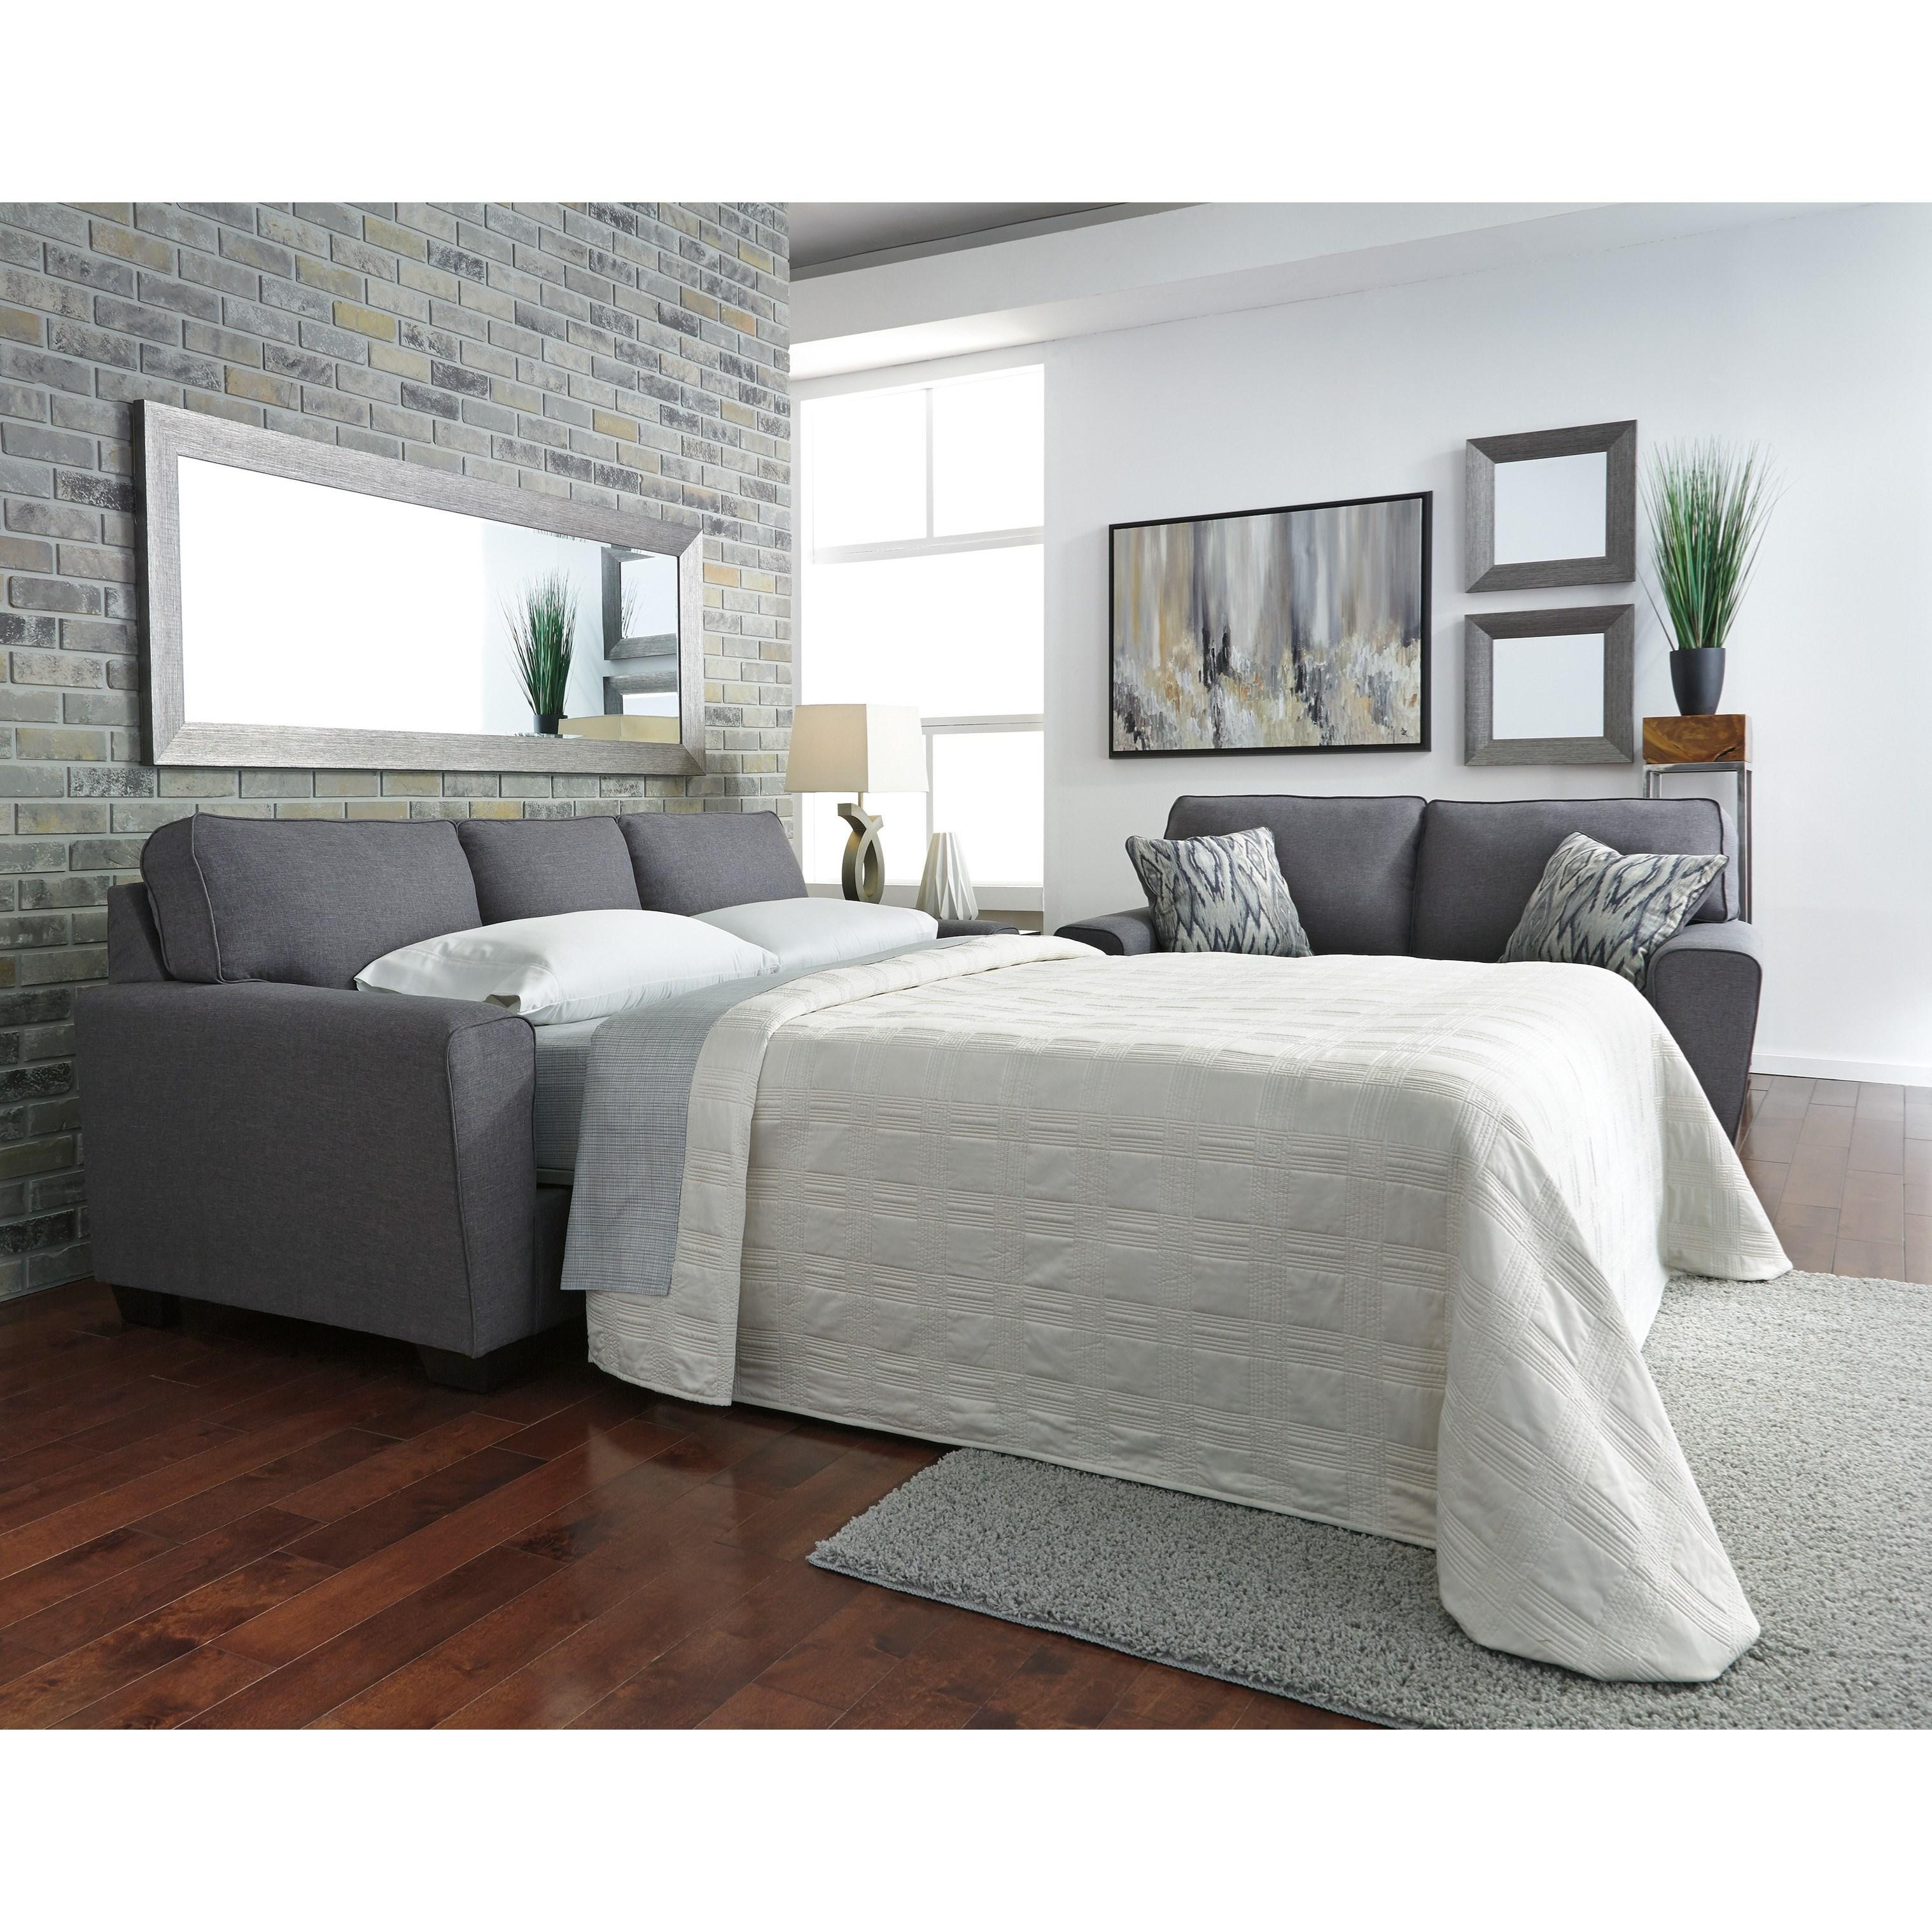 Ashley Furniture Calion 2070239 Contemporary Queen Sofa